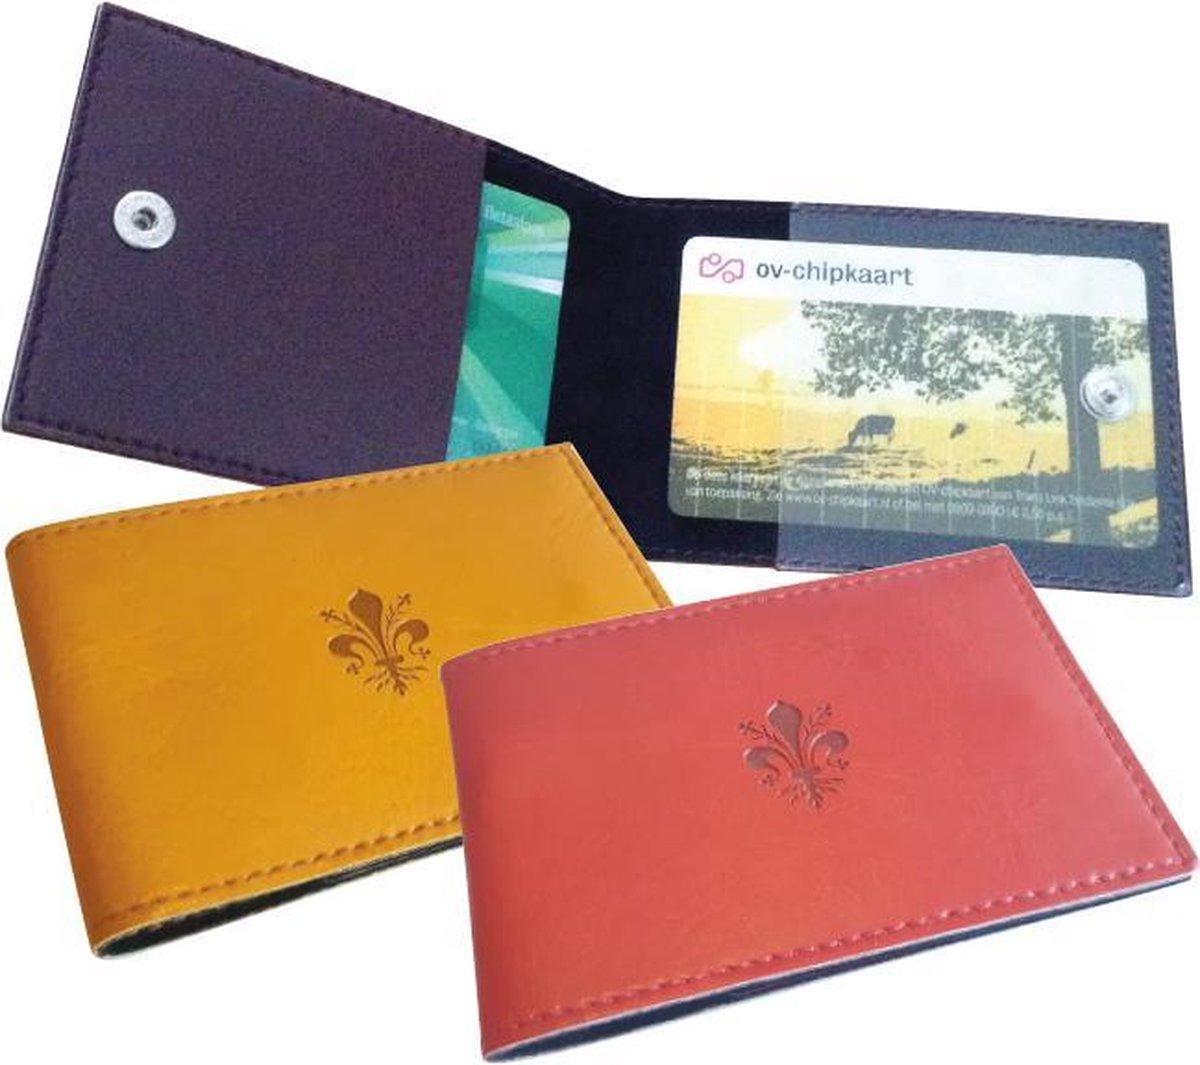 OV Chipkaarthouder,  Kaart portemonnee, Kaarthouder, Pasjeshouder, Creditcardhouder met 2 binnenzakken - Donkerrood | Lily Collection